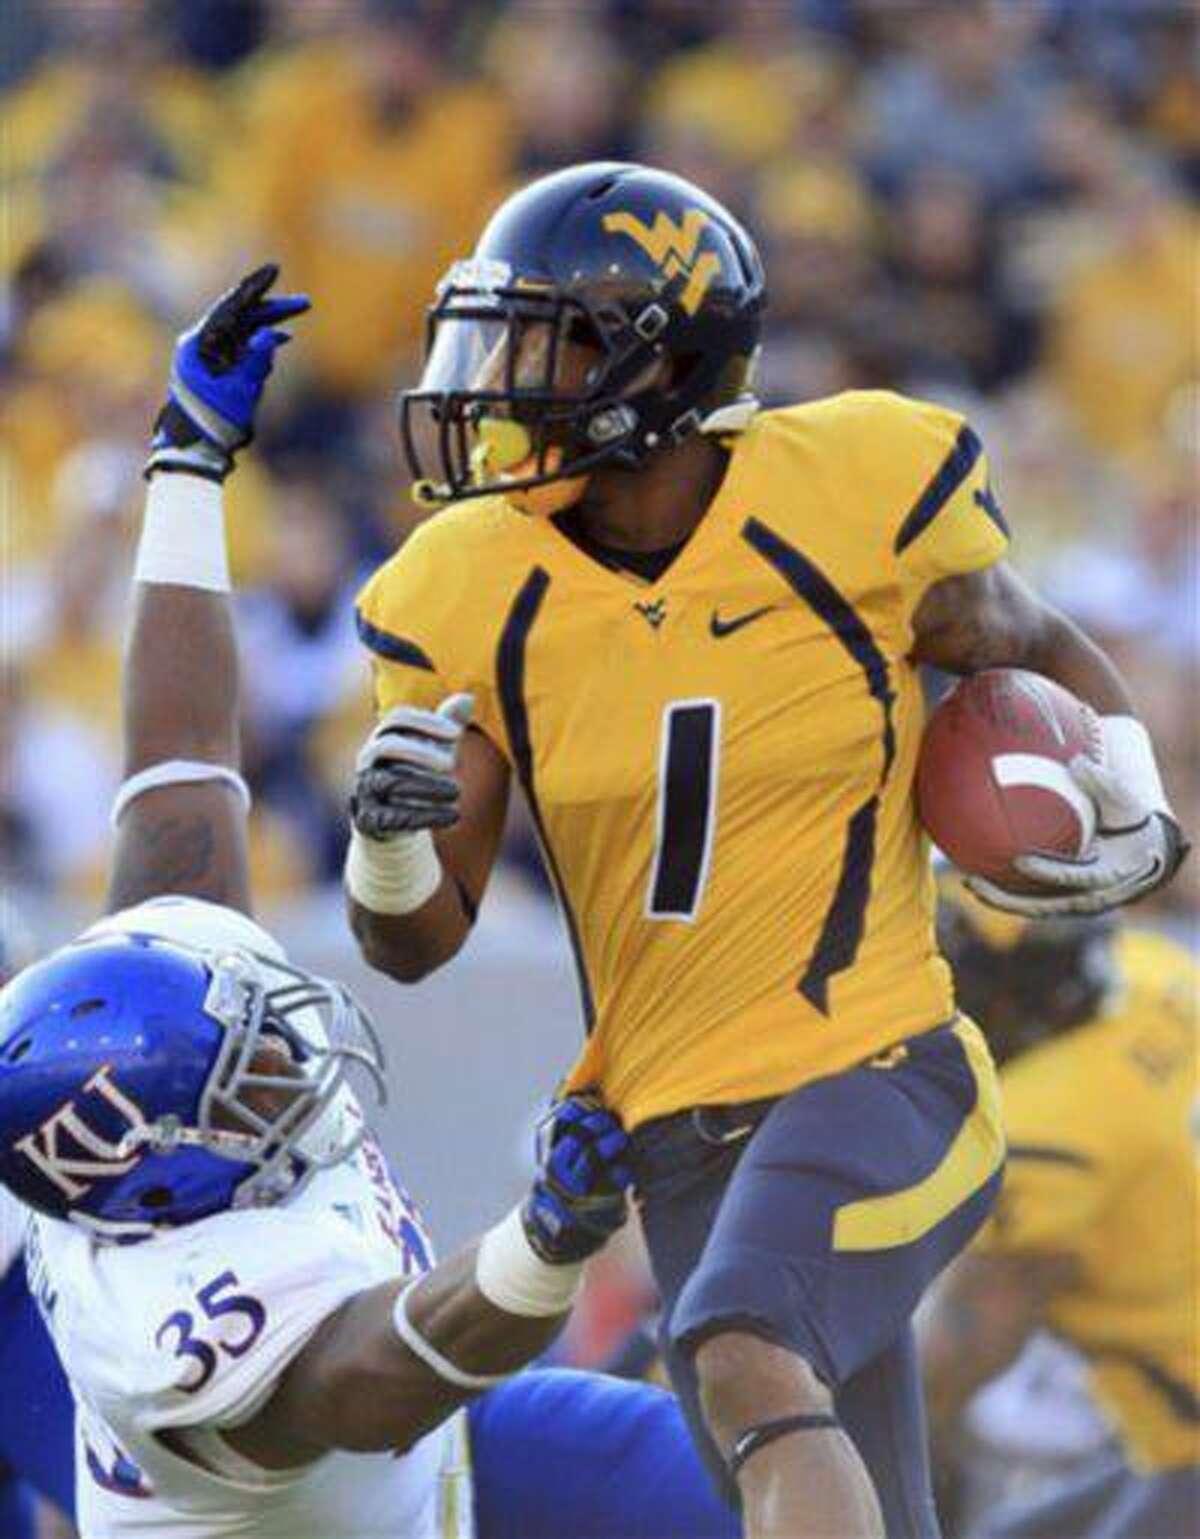 West Virginia's Tavon Austin (1) breaks a tackle by Kansas' Toben Opurum (35) during the first quarter of an NCAA college football game against Kansas in Morgantown, W.Va., Dec. 1, 2012.